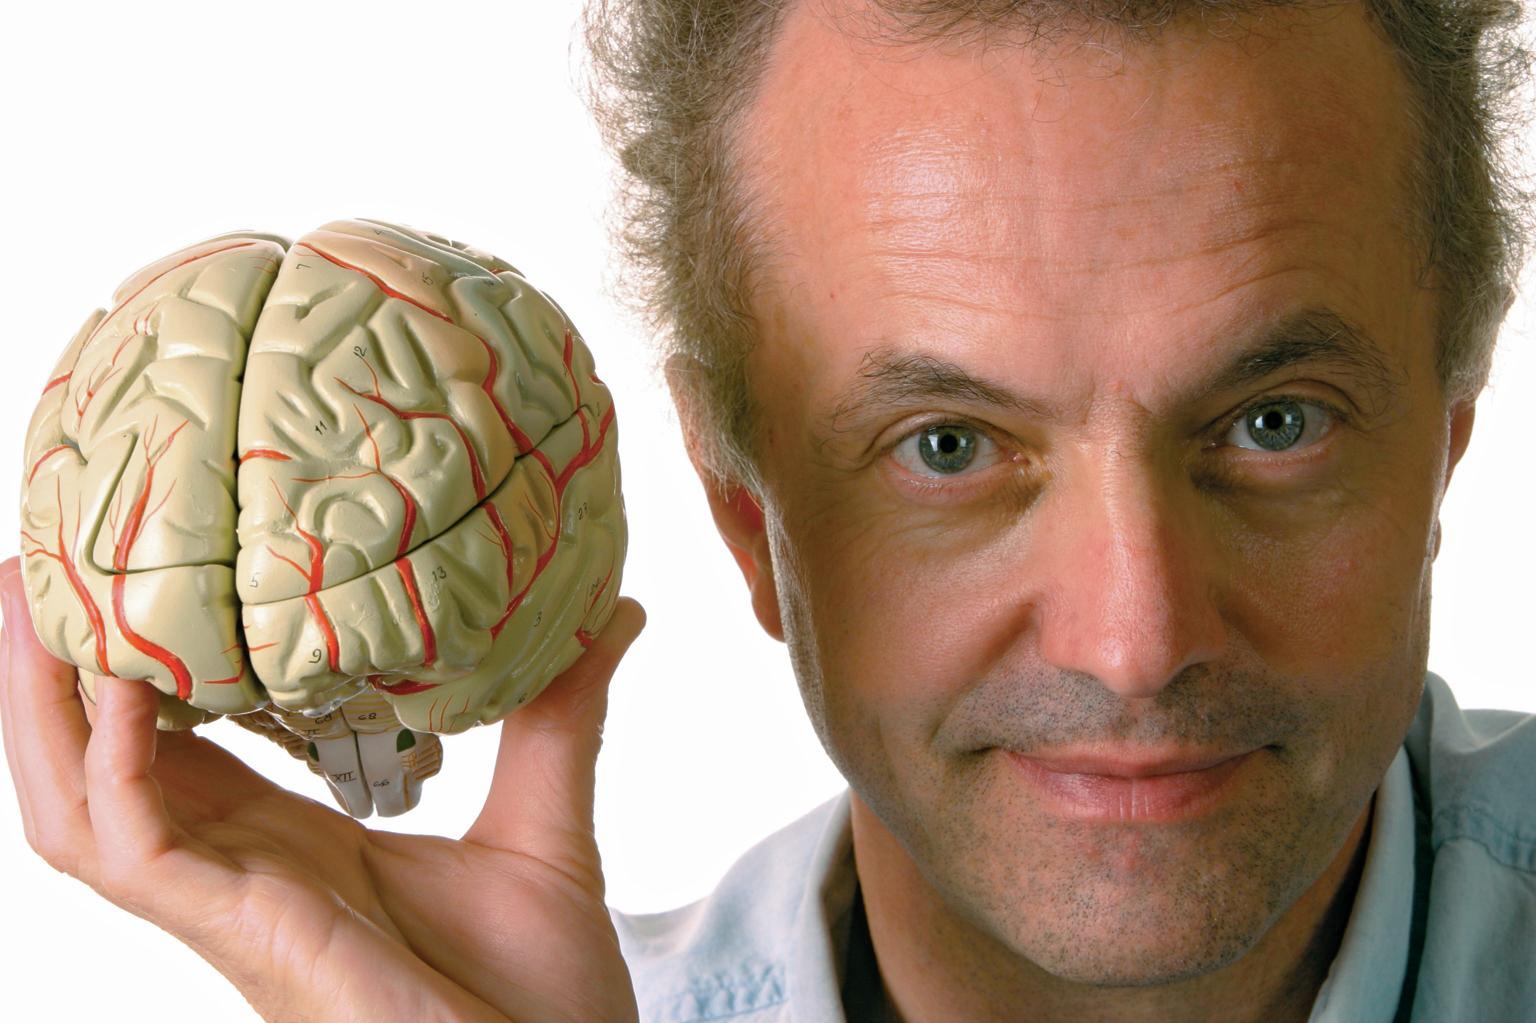 мужчина держит макет мозга